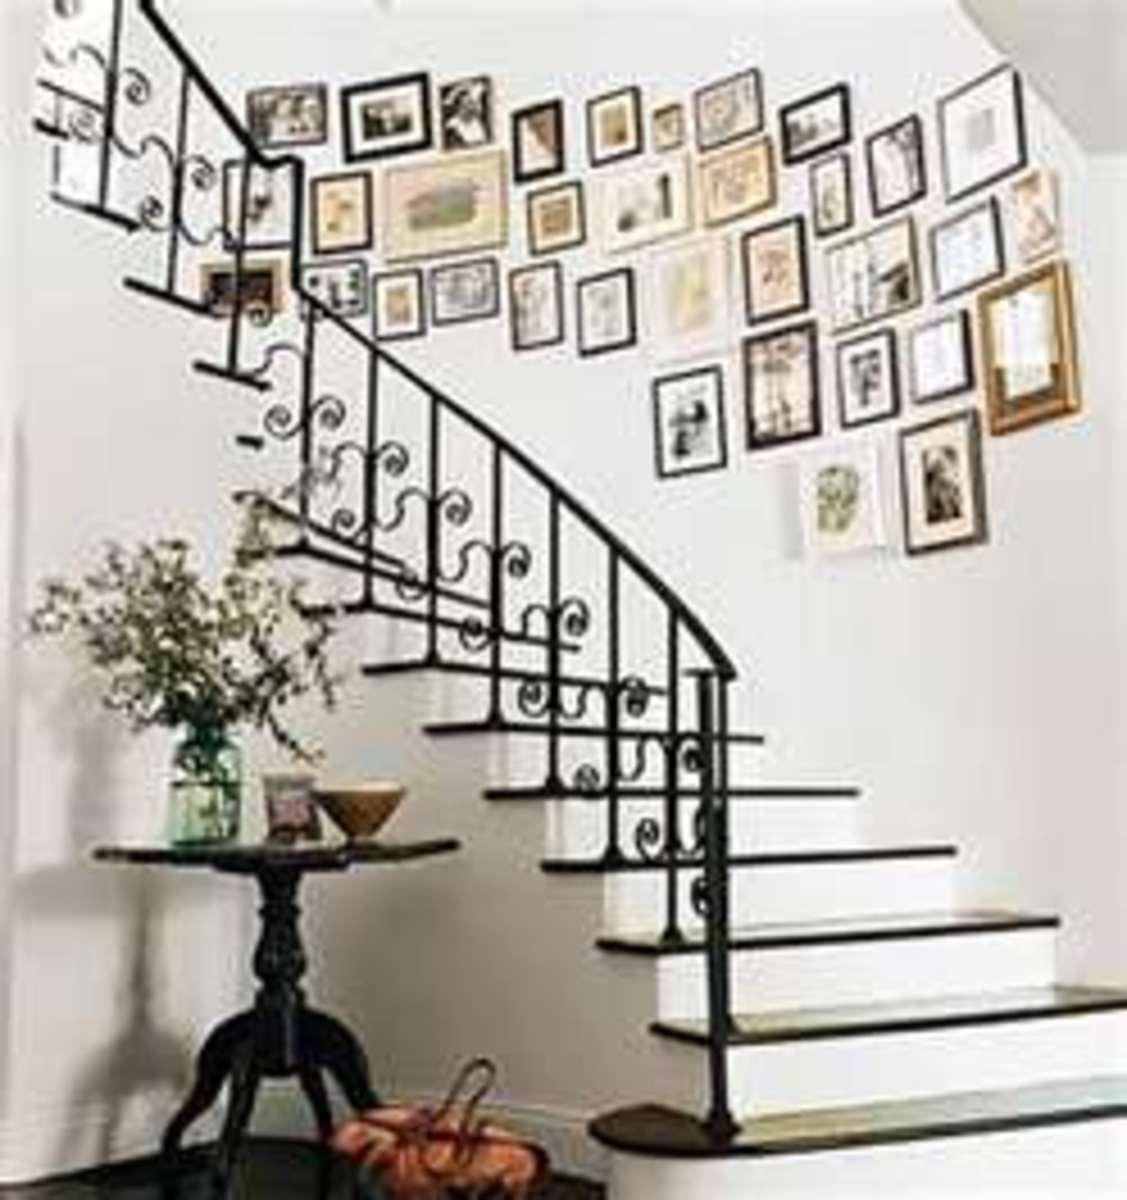 Image credit: http://jourdanguidedesign.com/blog/2010/04/collaging-memories-as-art/